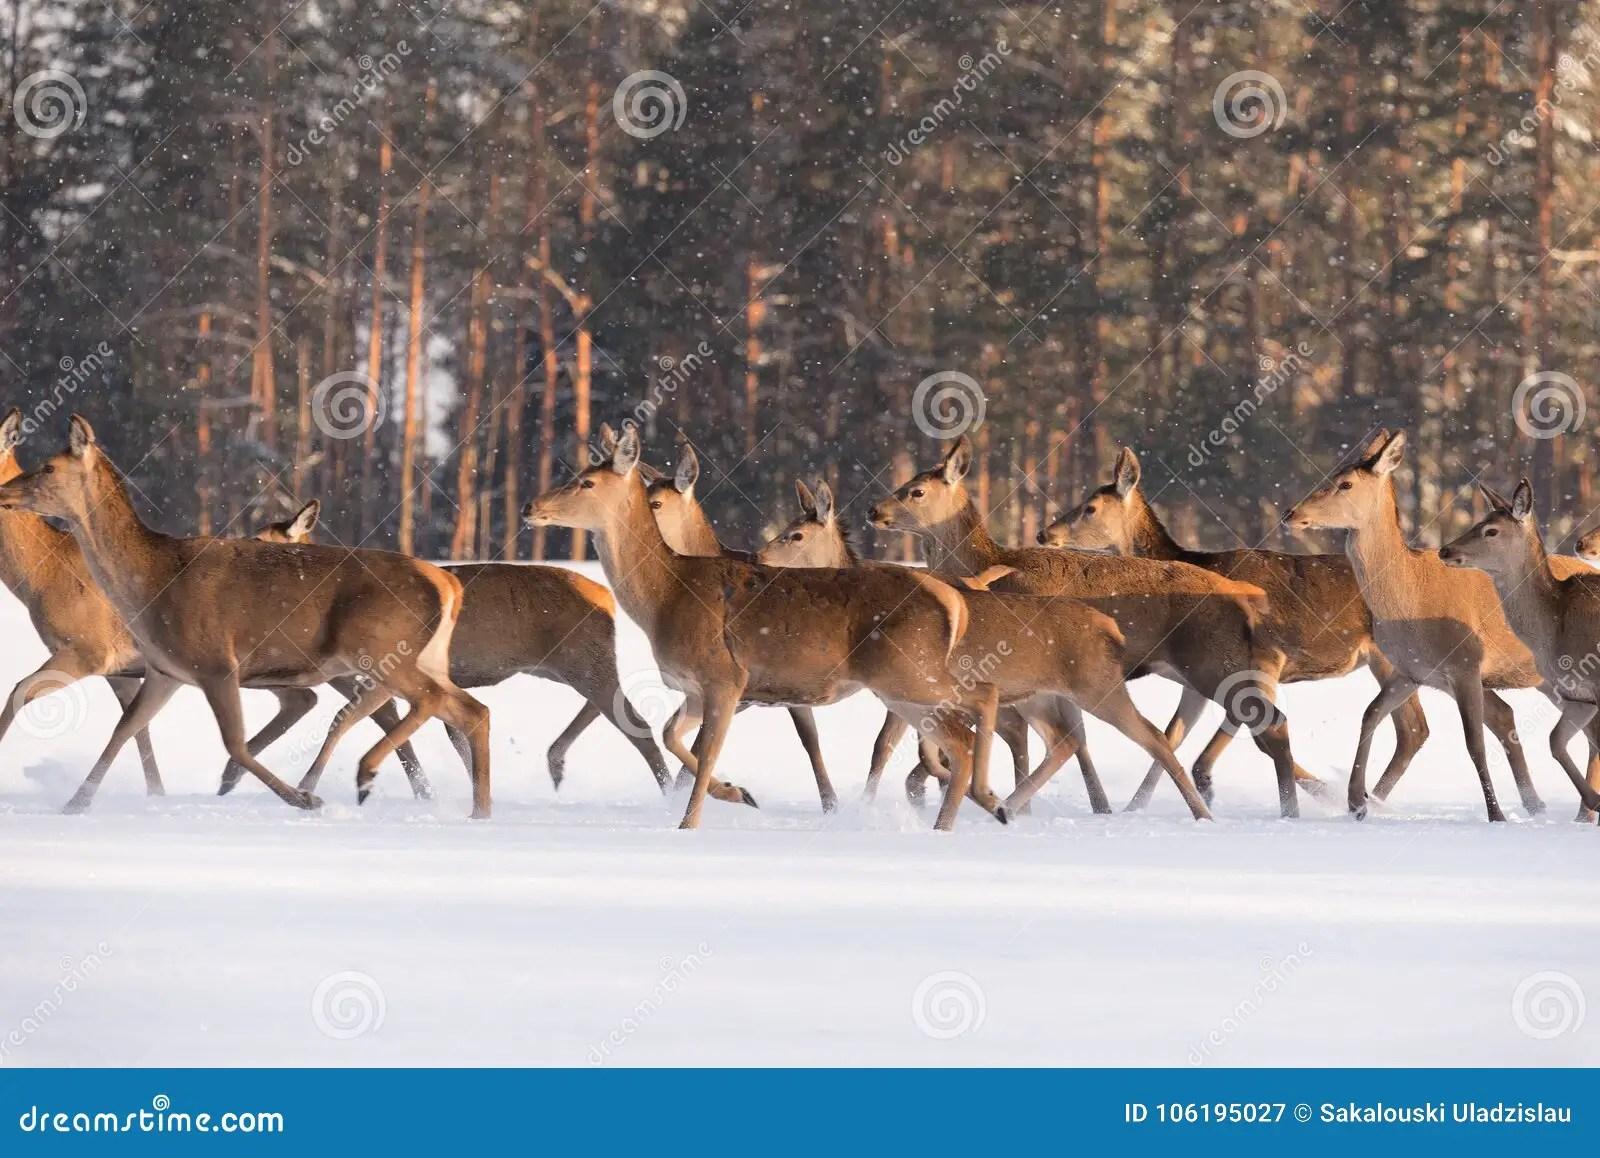 Deer Run On Snow. Numerous Herd Of Deer Cervus Elaphus, Illuminated